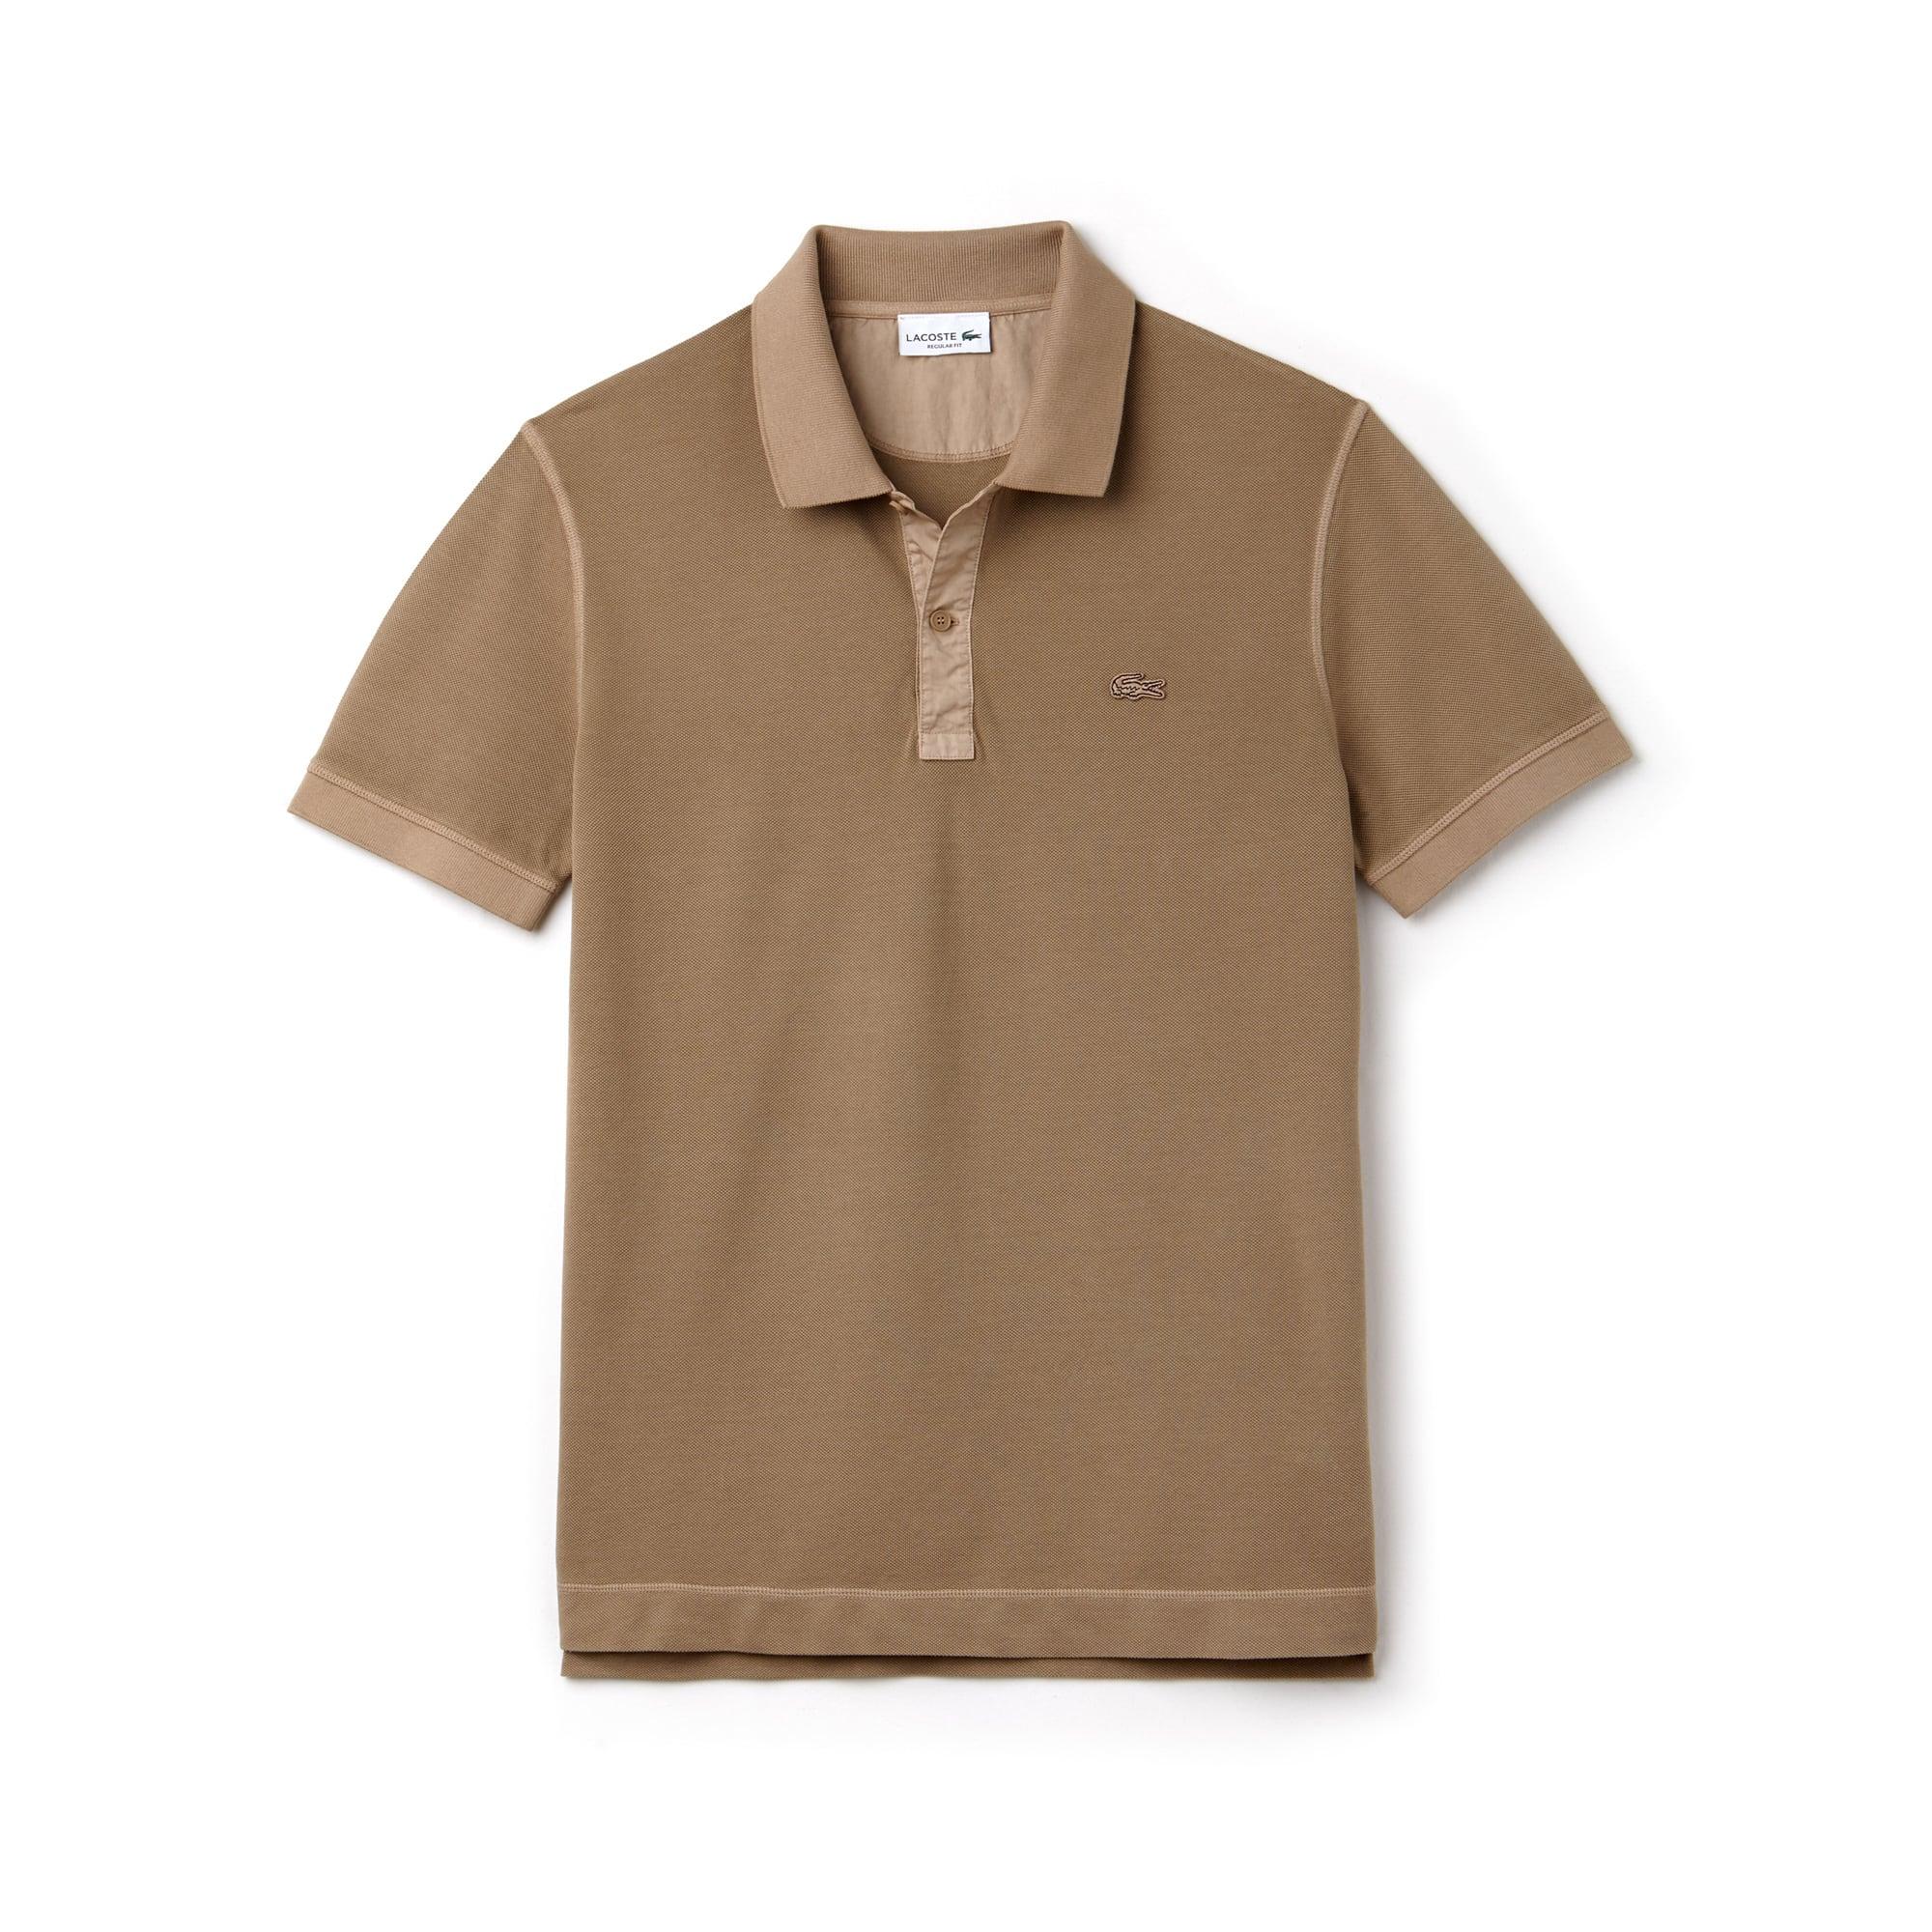 Regular Fit Herren-Poloshirt aus Strickware